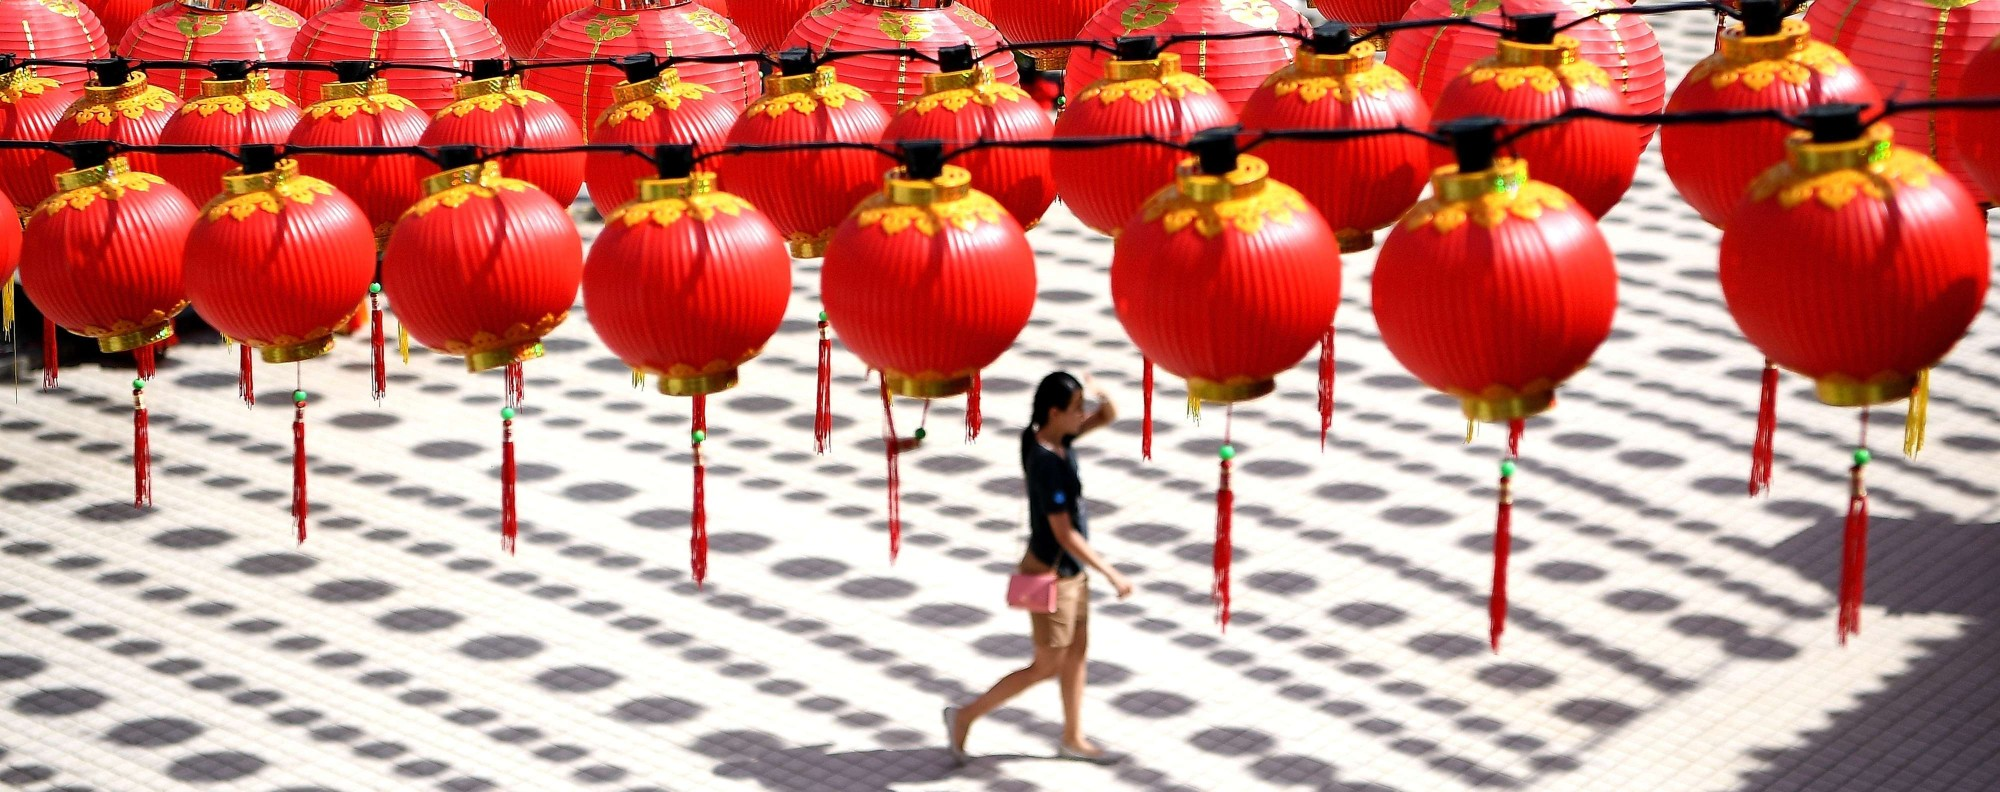 A woman walks under traditional Chinese lanterns in Kuala Lumpur. Photo: AFP